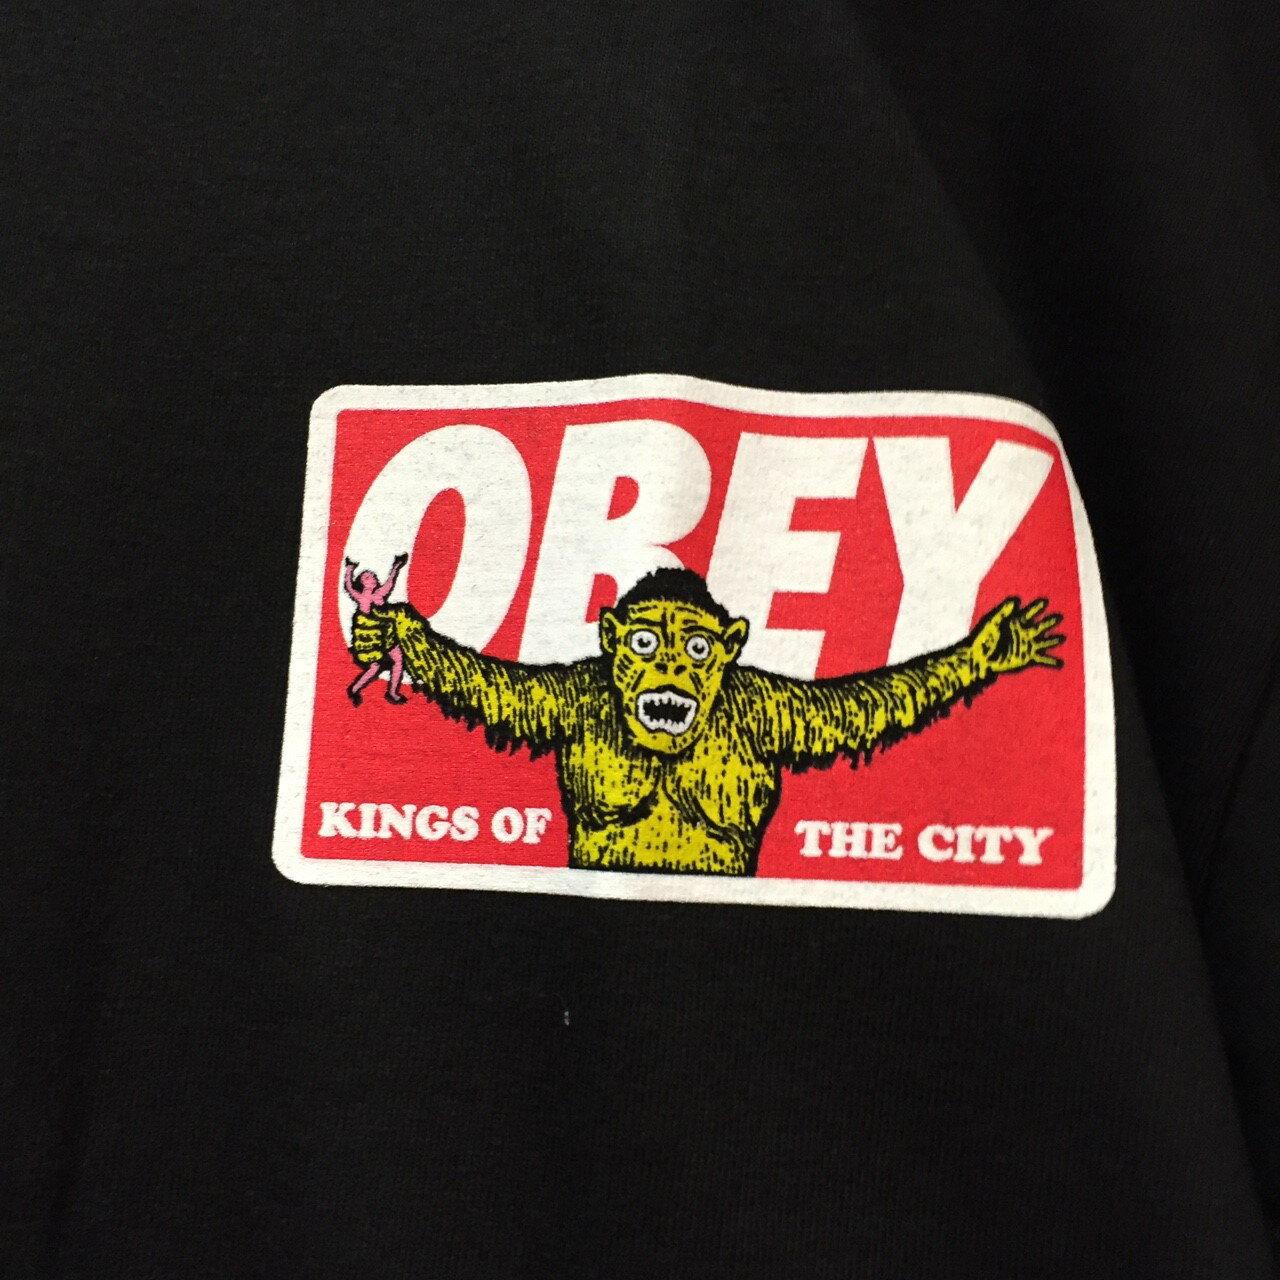 BEETLE PLUS 西門町經銷 全新 美國品牌 OBEY KINGS OF THE CITY 城市之王 全黑 紅字 LOGO 短T TEE 163081152BLK OB-414 1